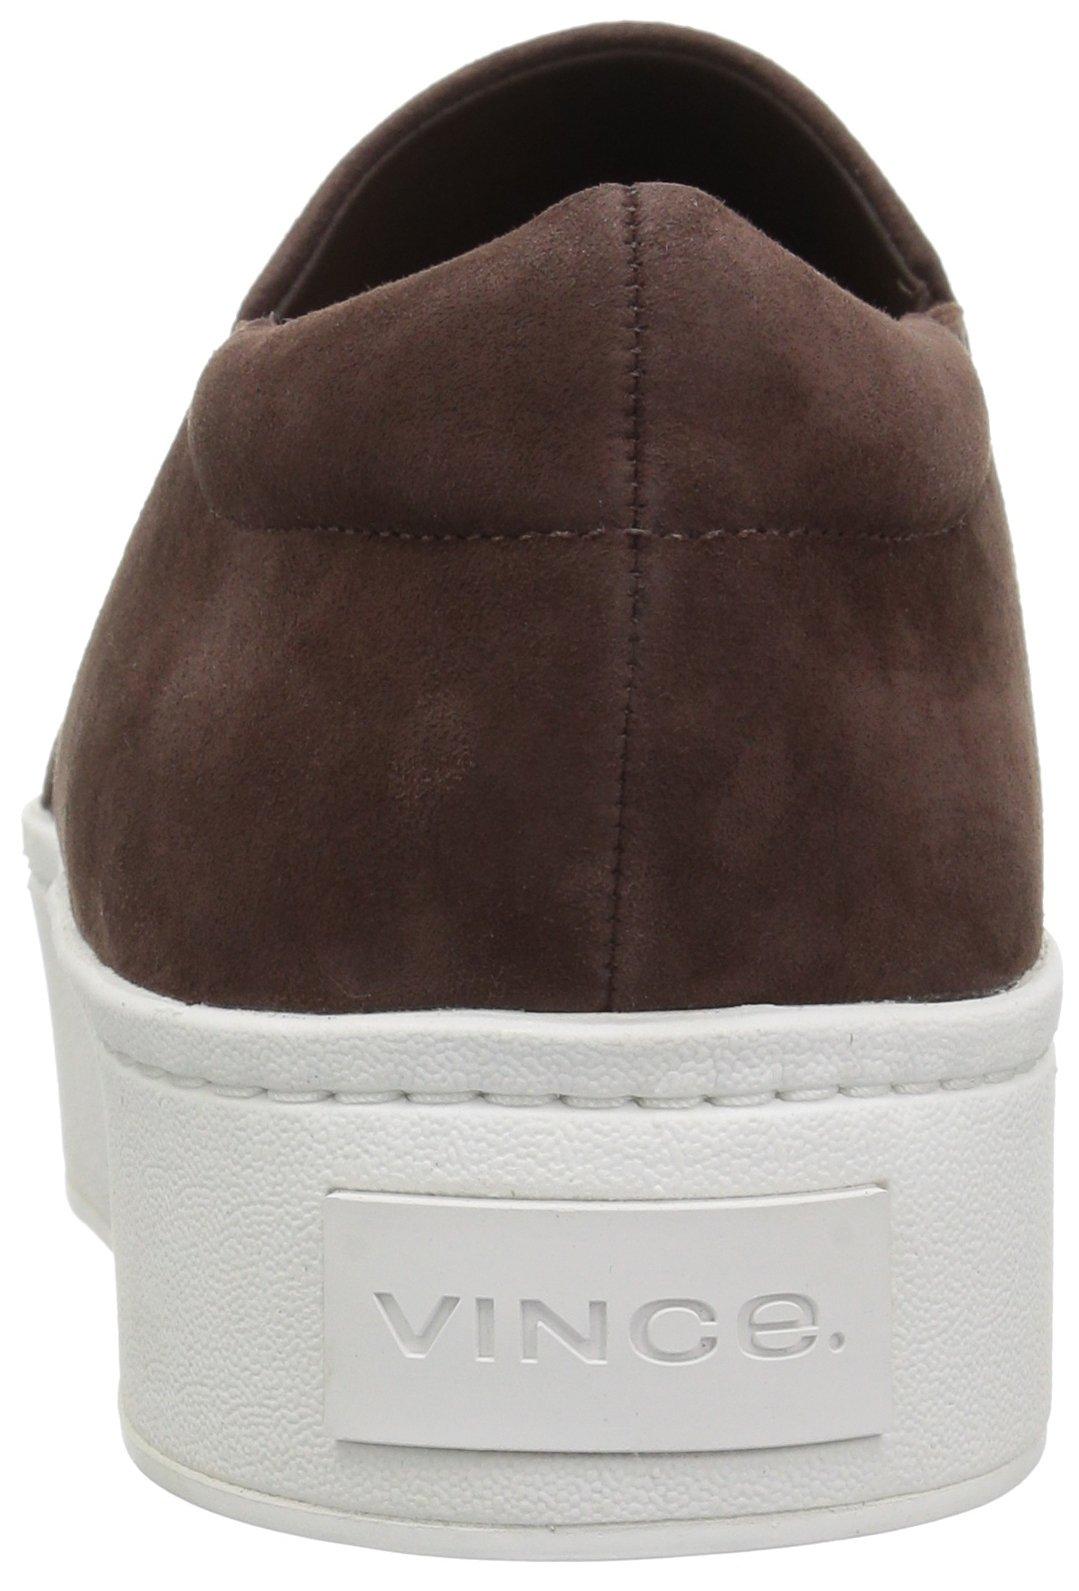 Vince Women's Warren Sneaker, Henna, 10 Medium US by Vince (Image #2)